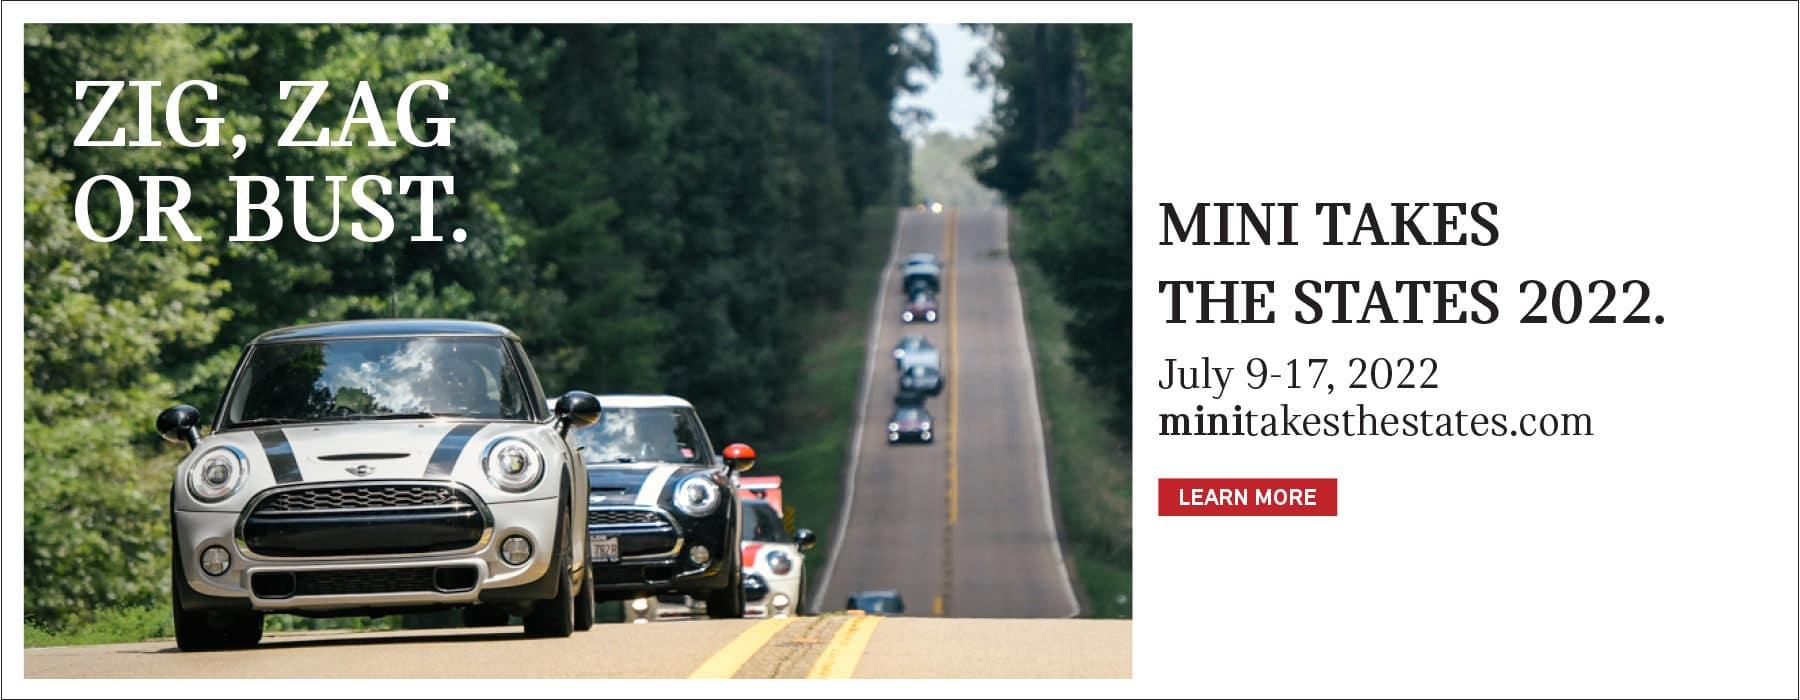 MINI Takes The States 2022. July 9-17th.